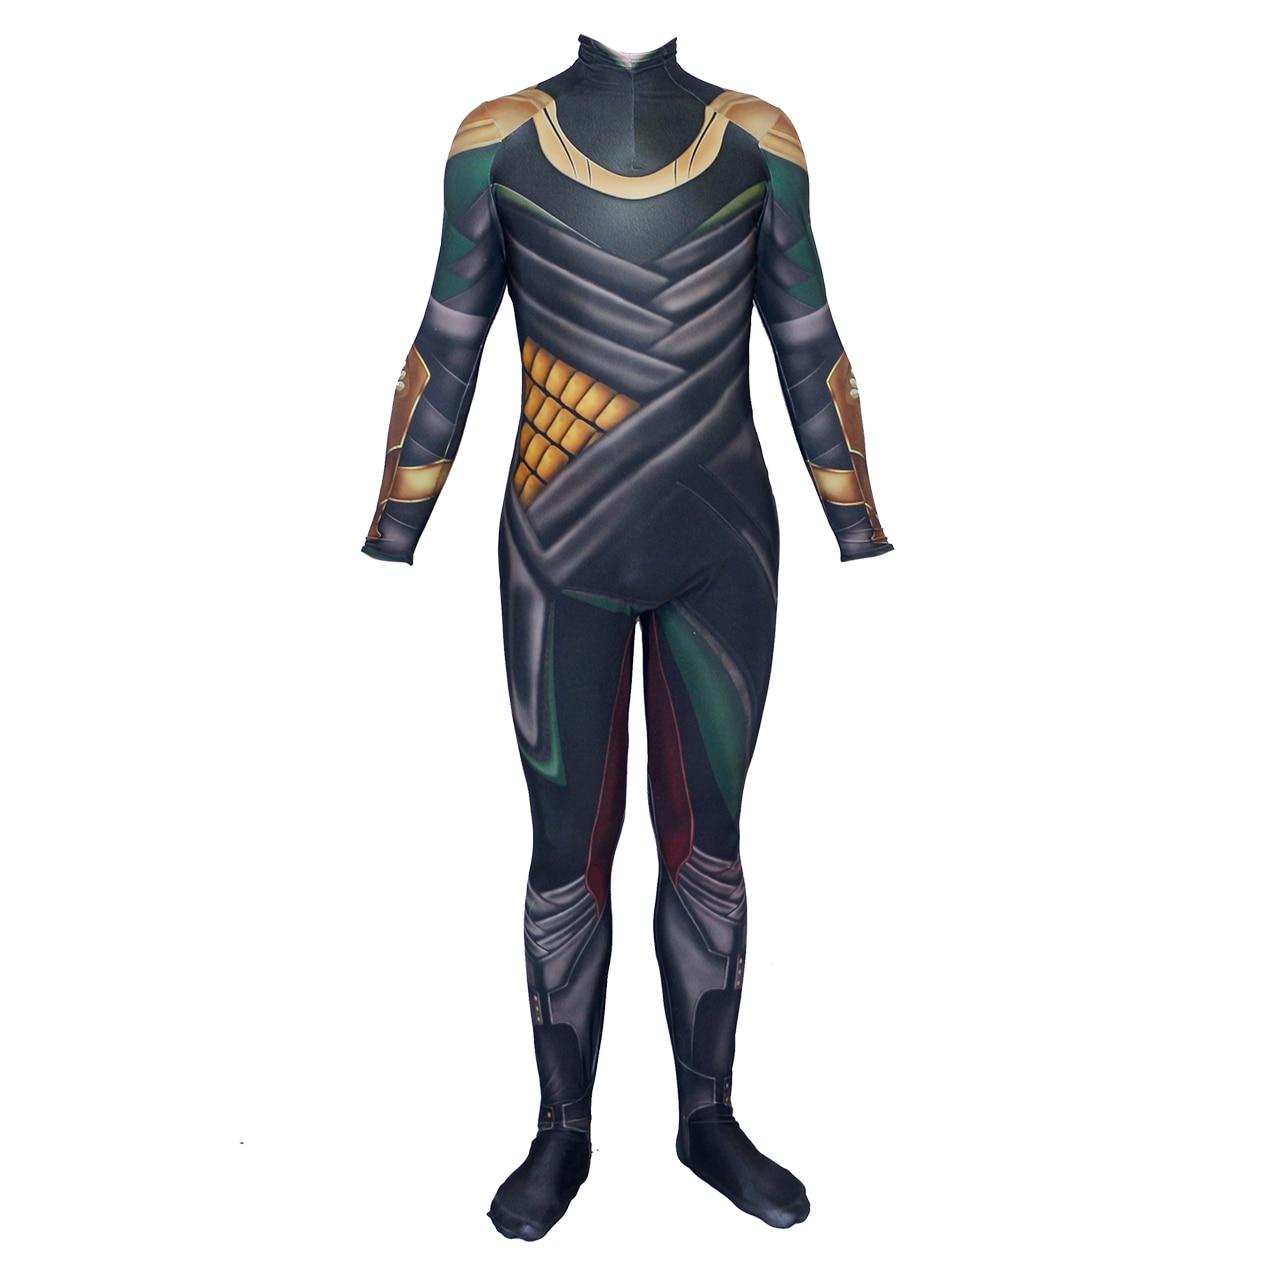 Thor The Dark World Loki Costume Whole Sets Cosplay Costume Halloween Party